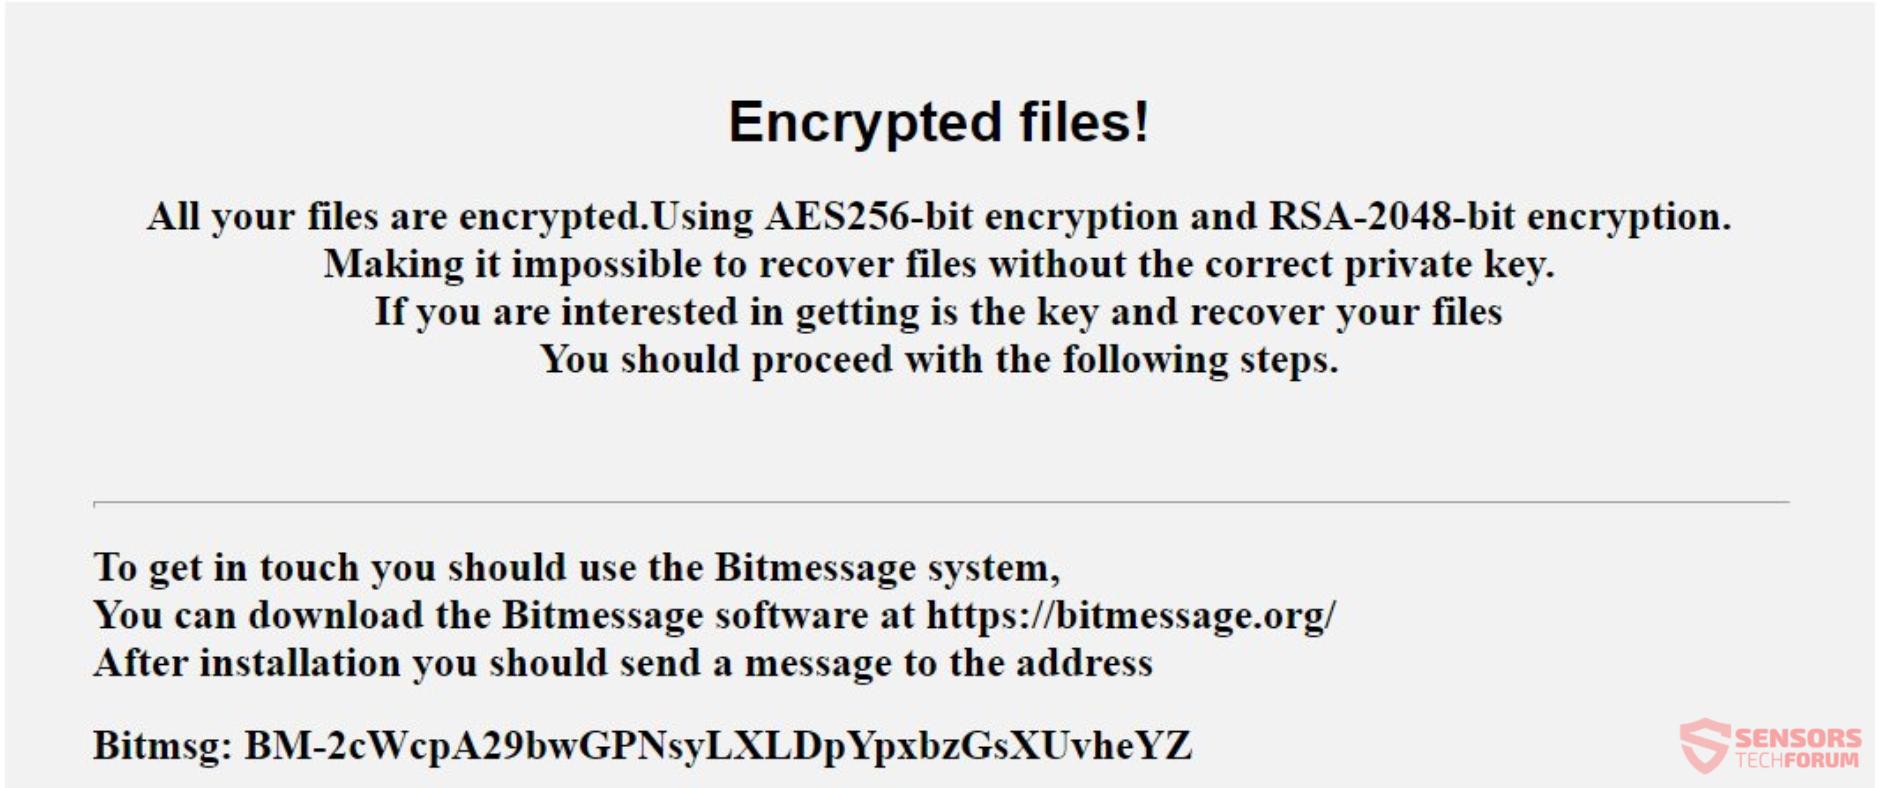 stf-hakunamatata-ransomware-hakuna-matata-virus-ransom-message